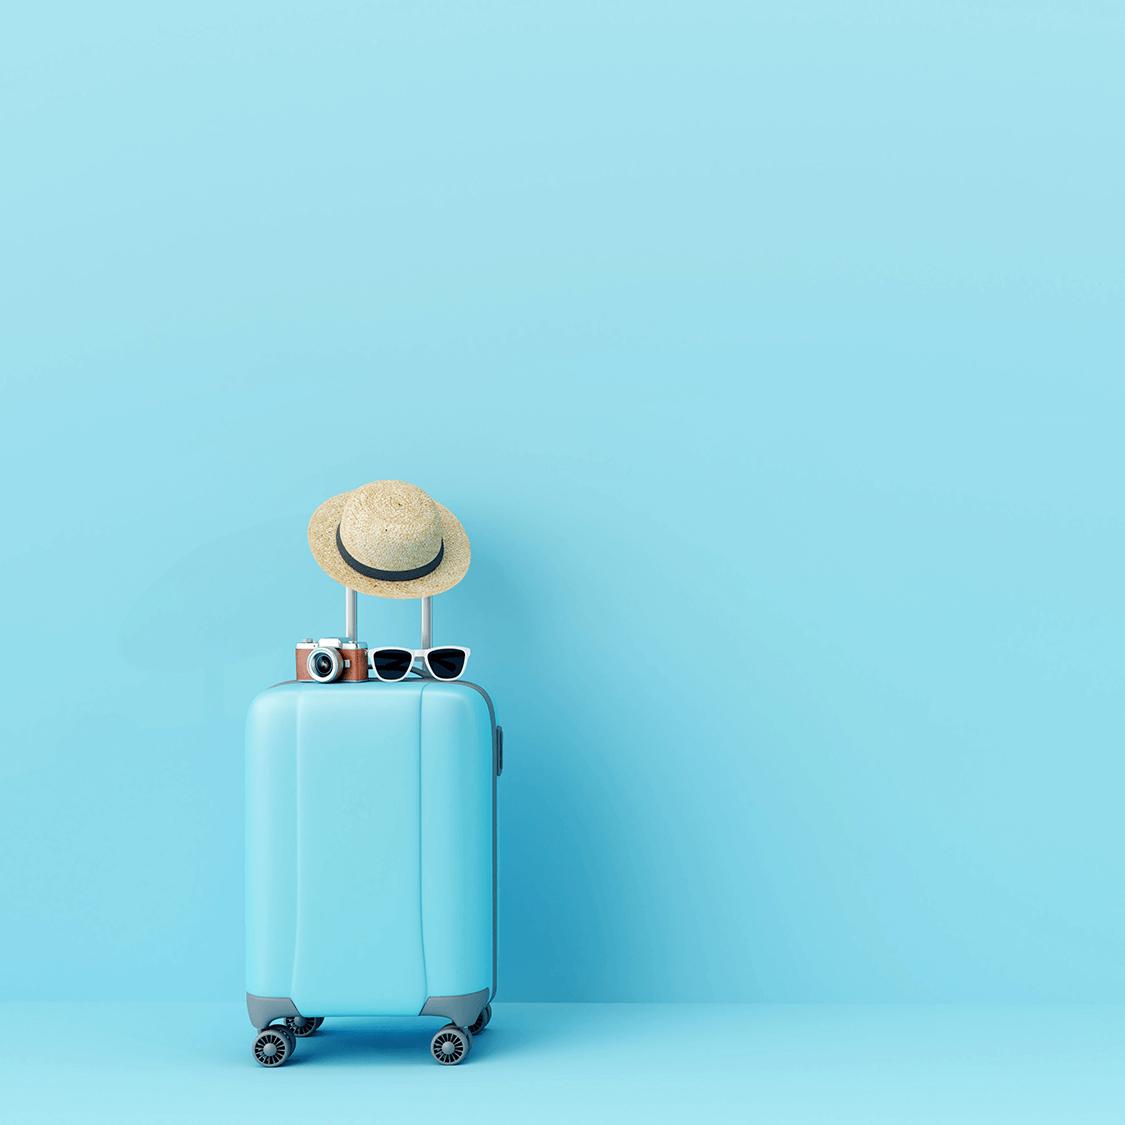 Travel | Pumping Marvellous